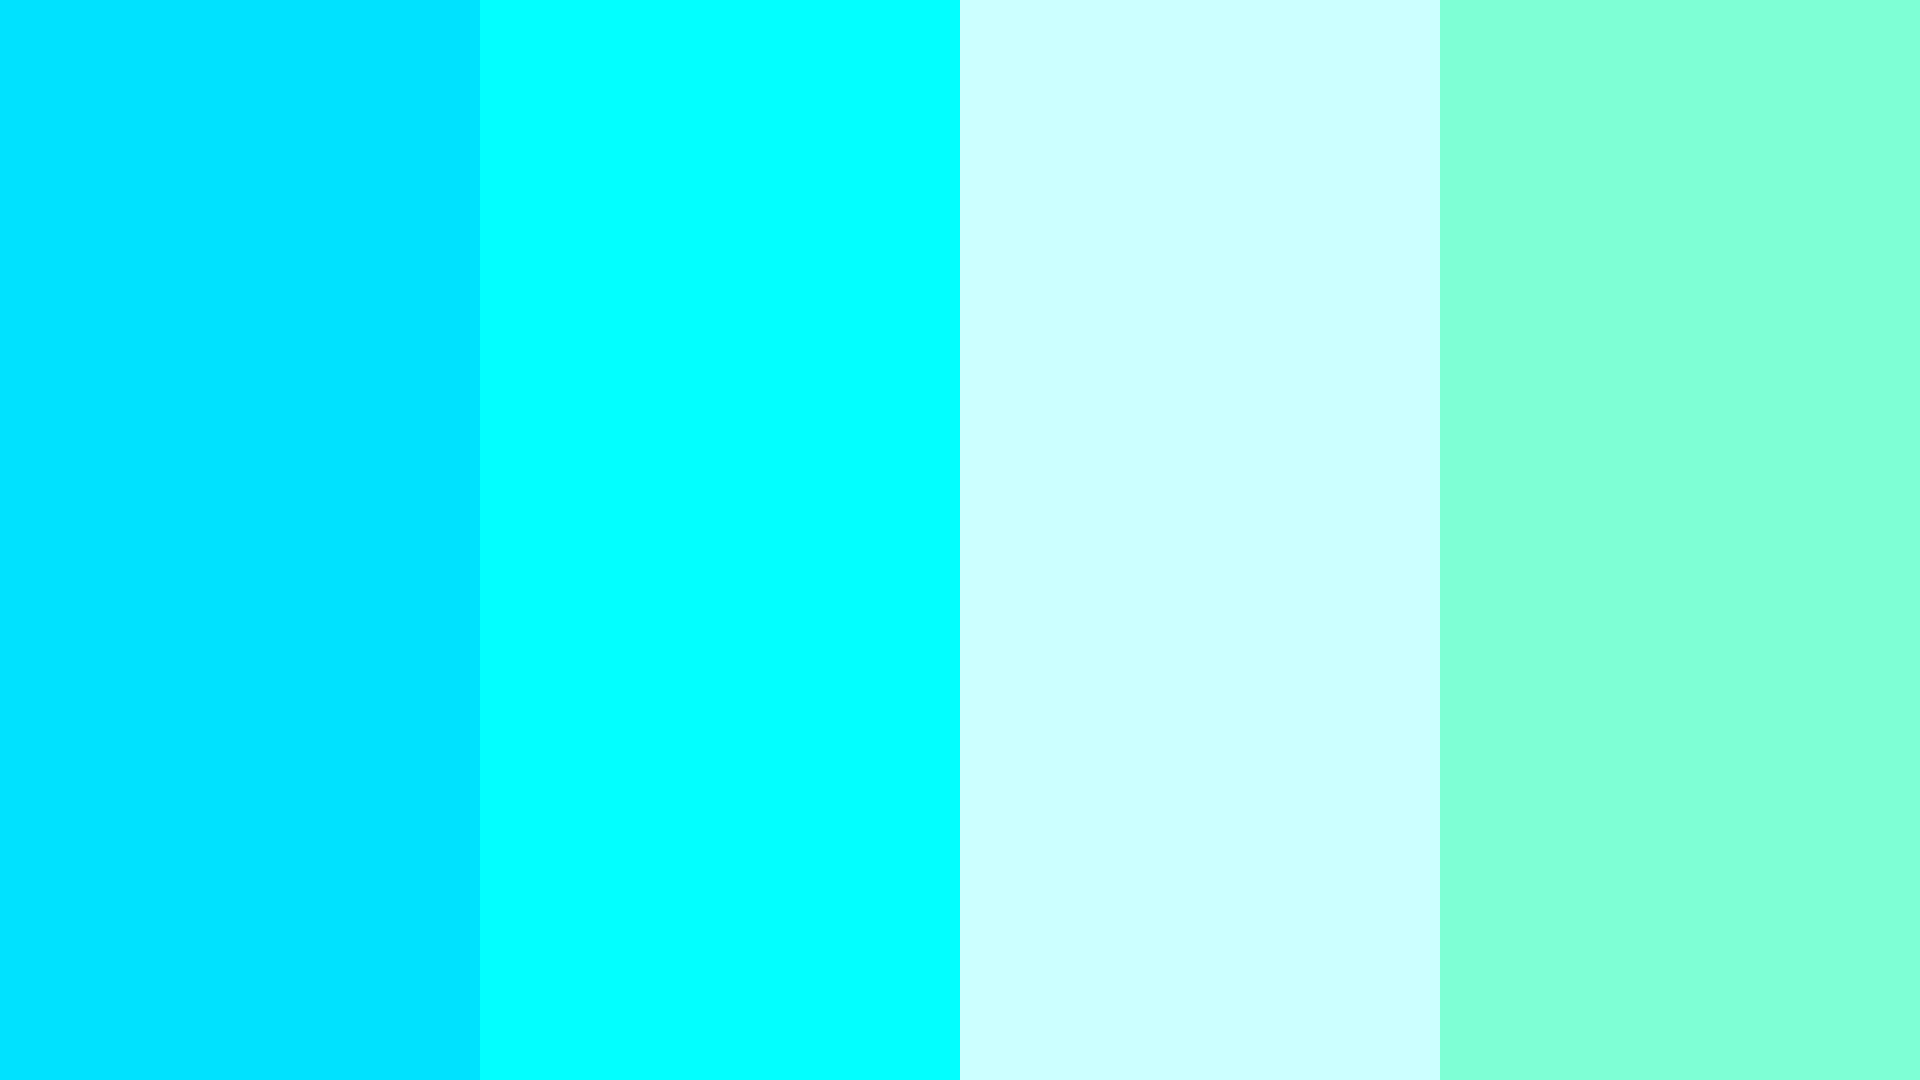 Show Me A Picture Of The Color Aqua